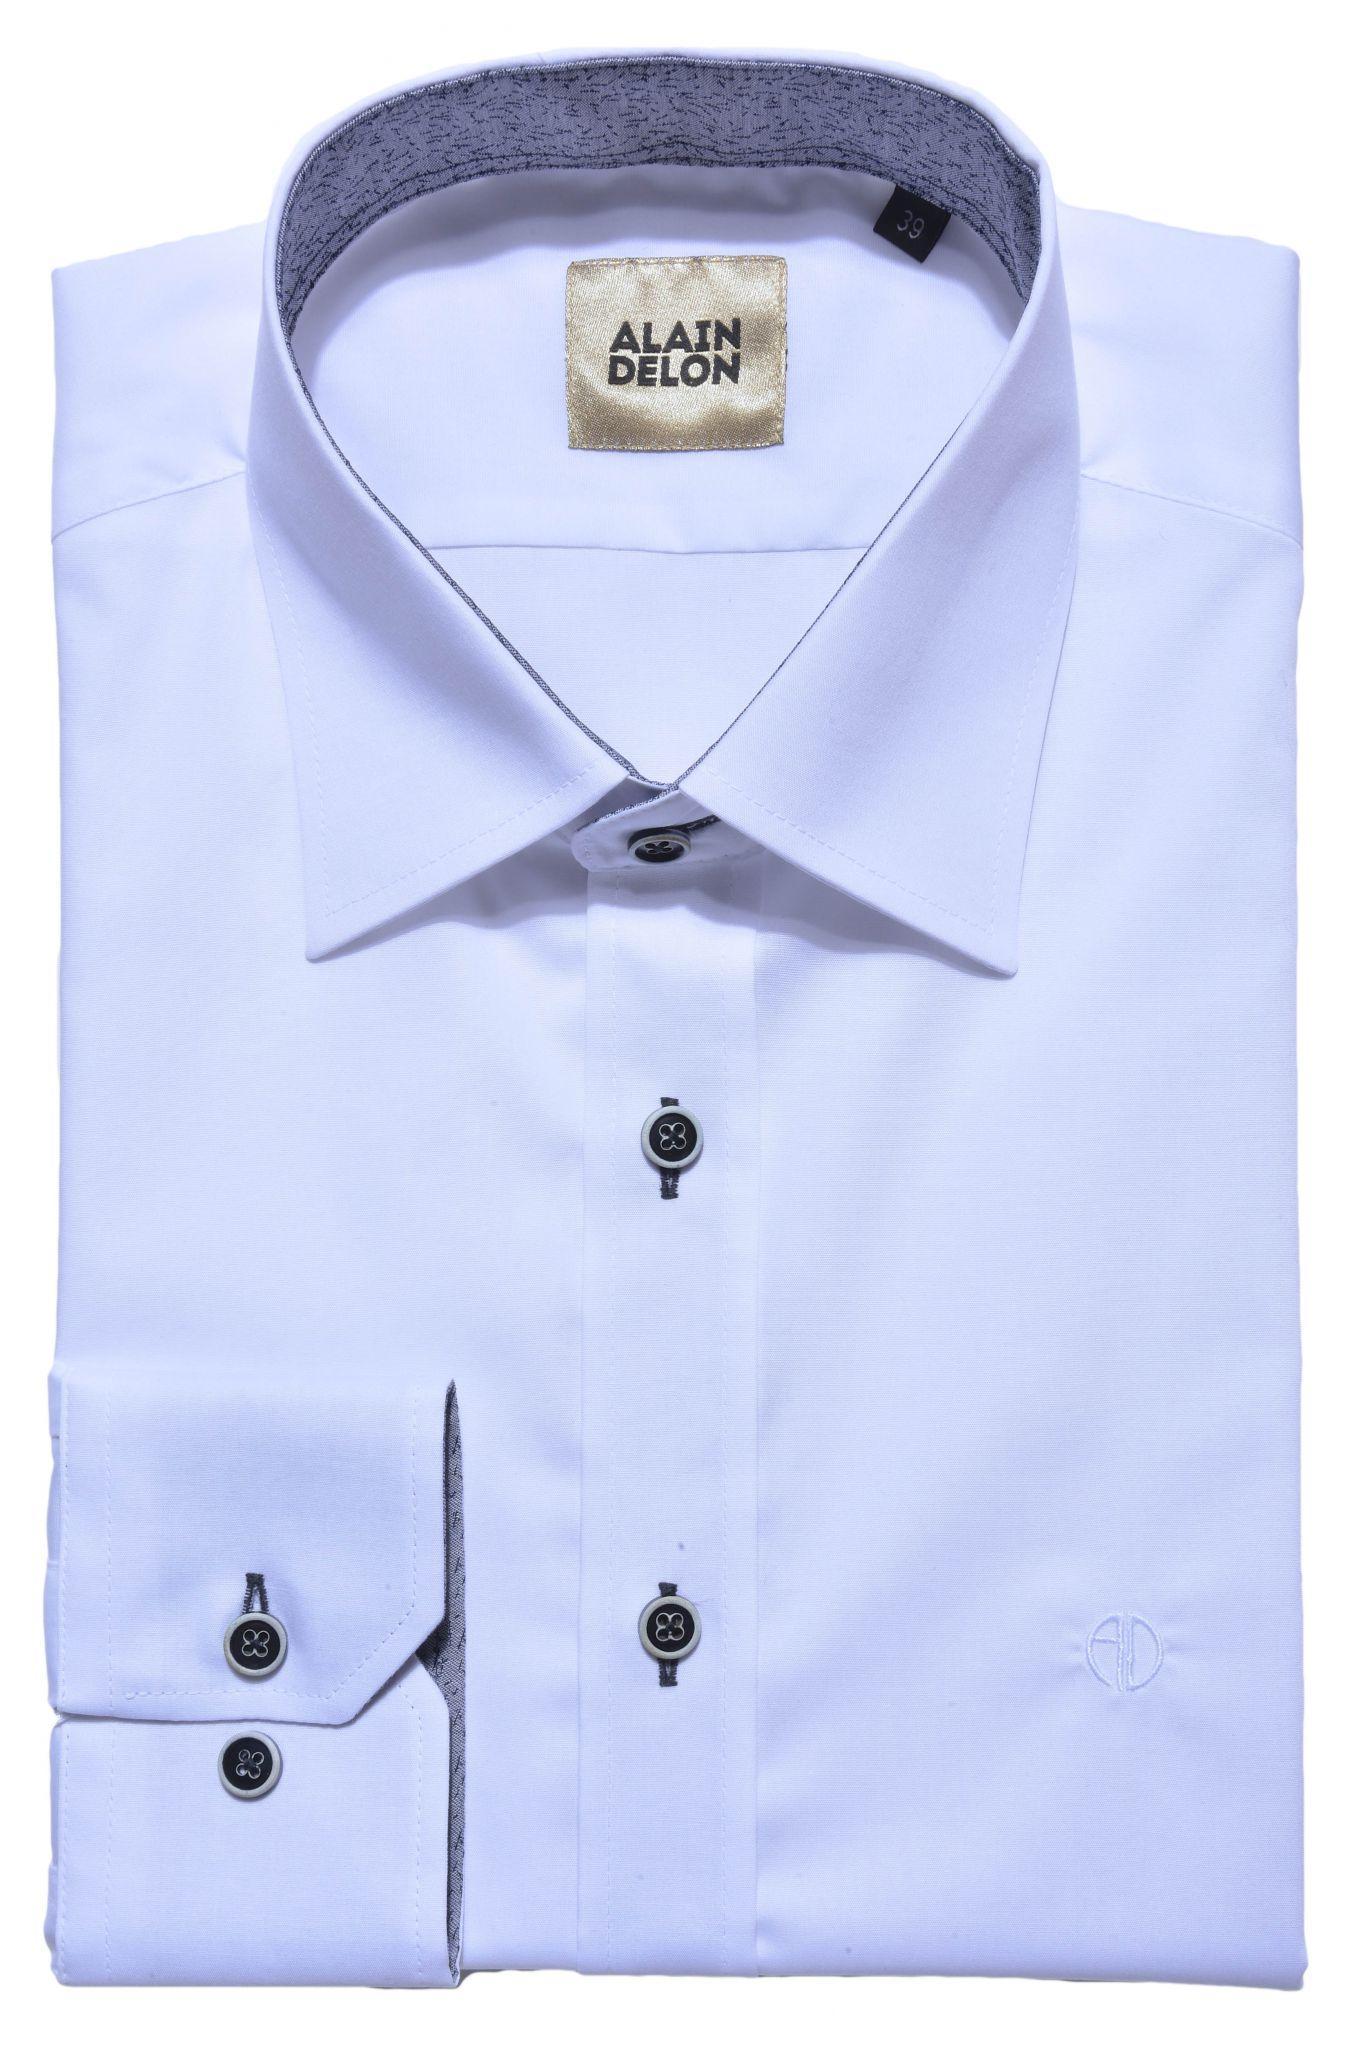 White Extra Slim Fit Shirt Shirts E Shop Alaindelon